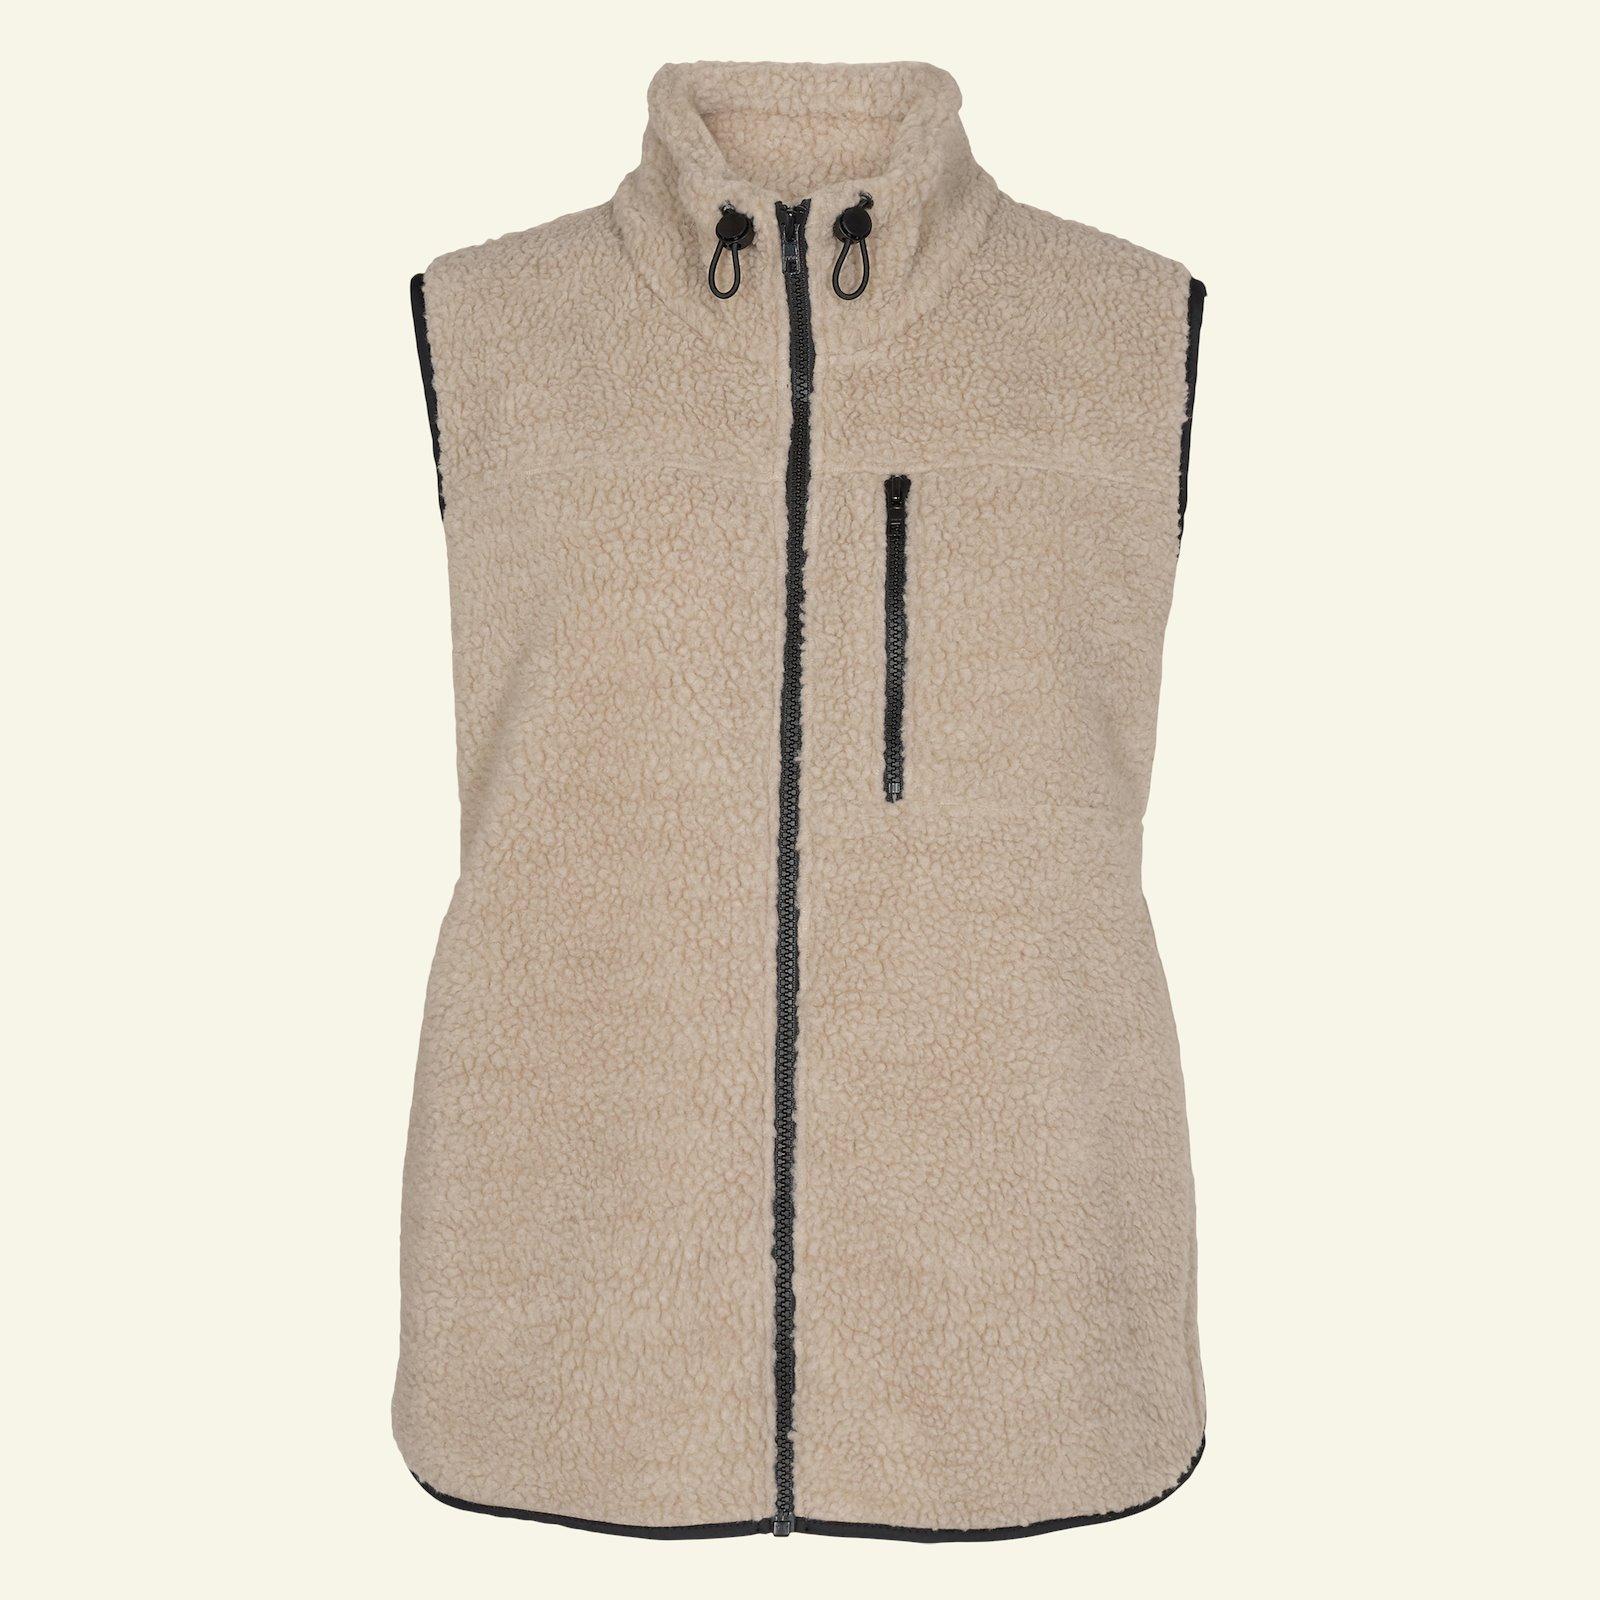 Organic stretch jersey light greymelange p24049_910273_271504_64080_sskit